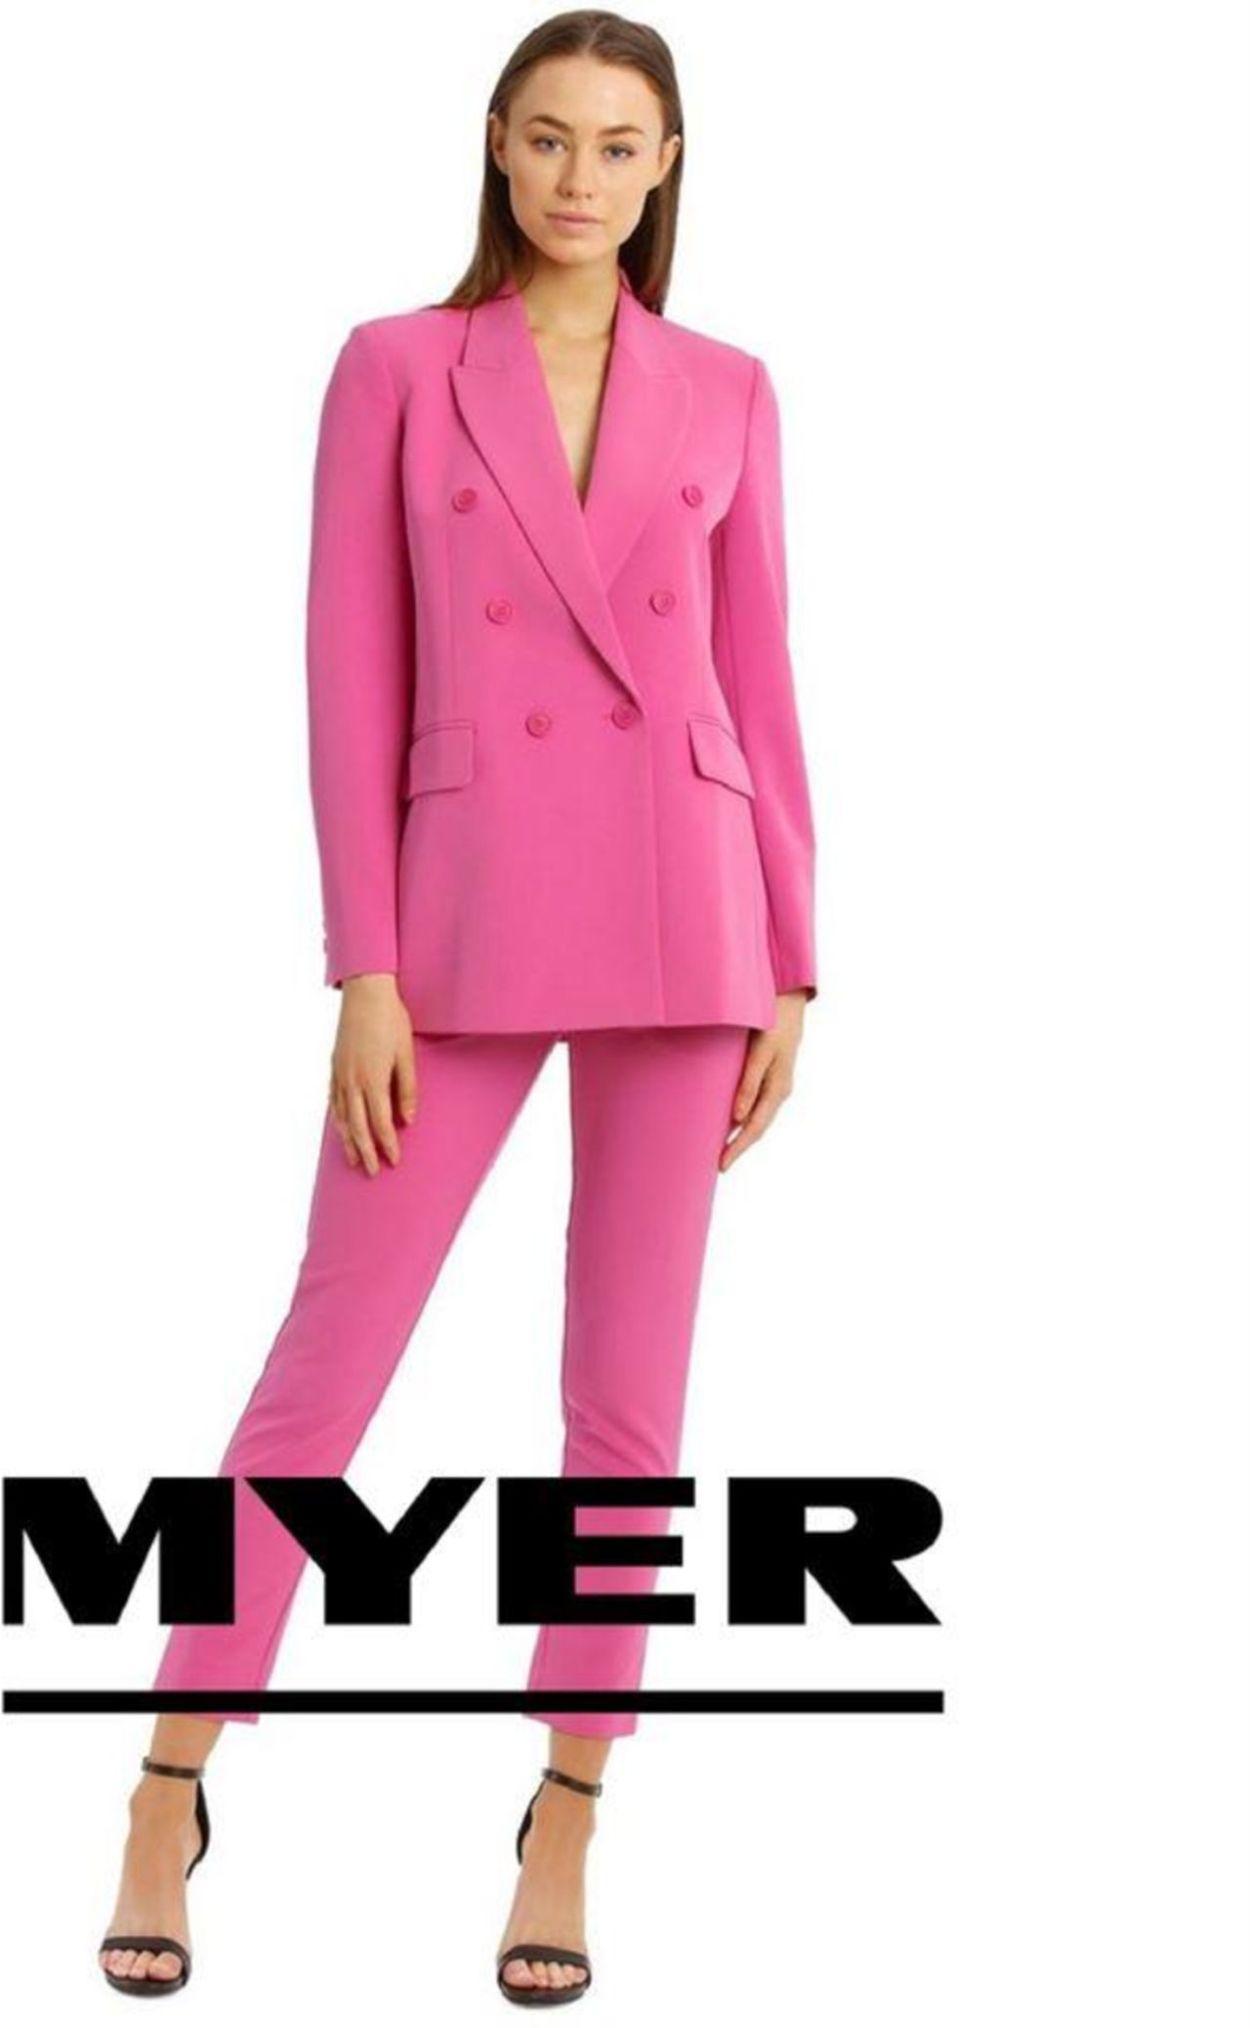 Myer Catalogue - 22/07-22/08/2019